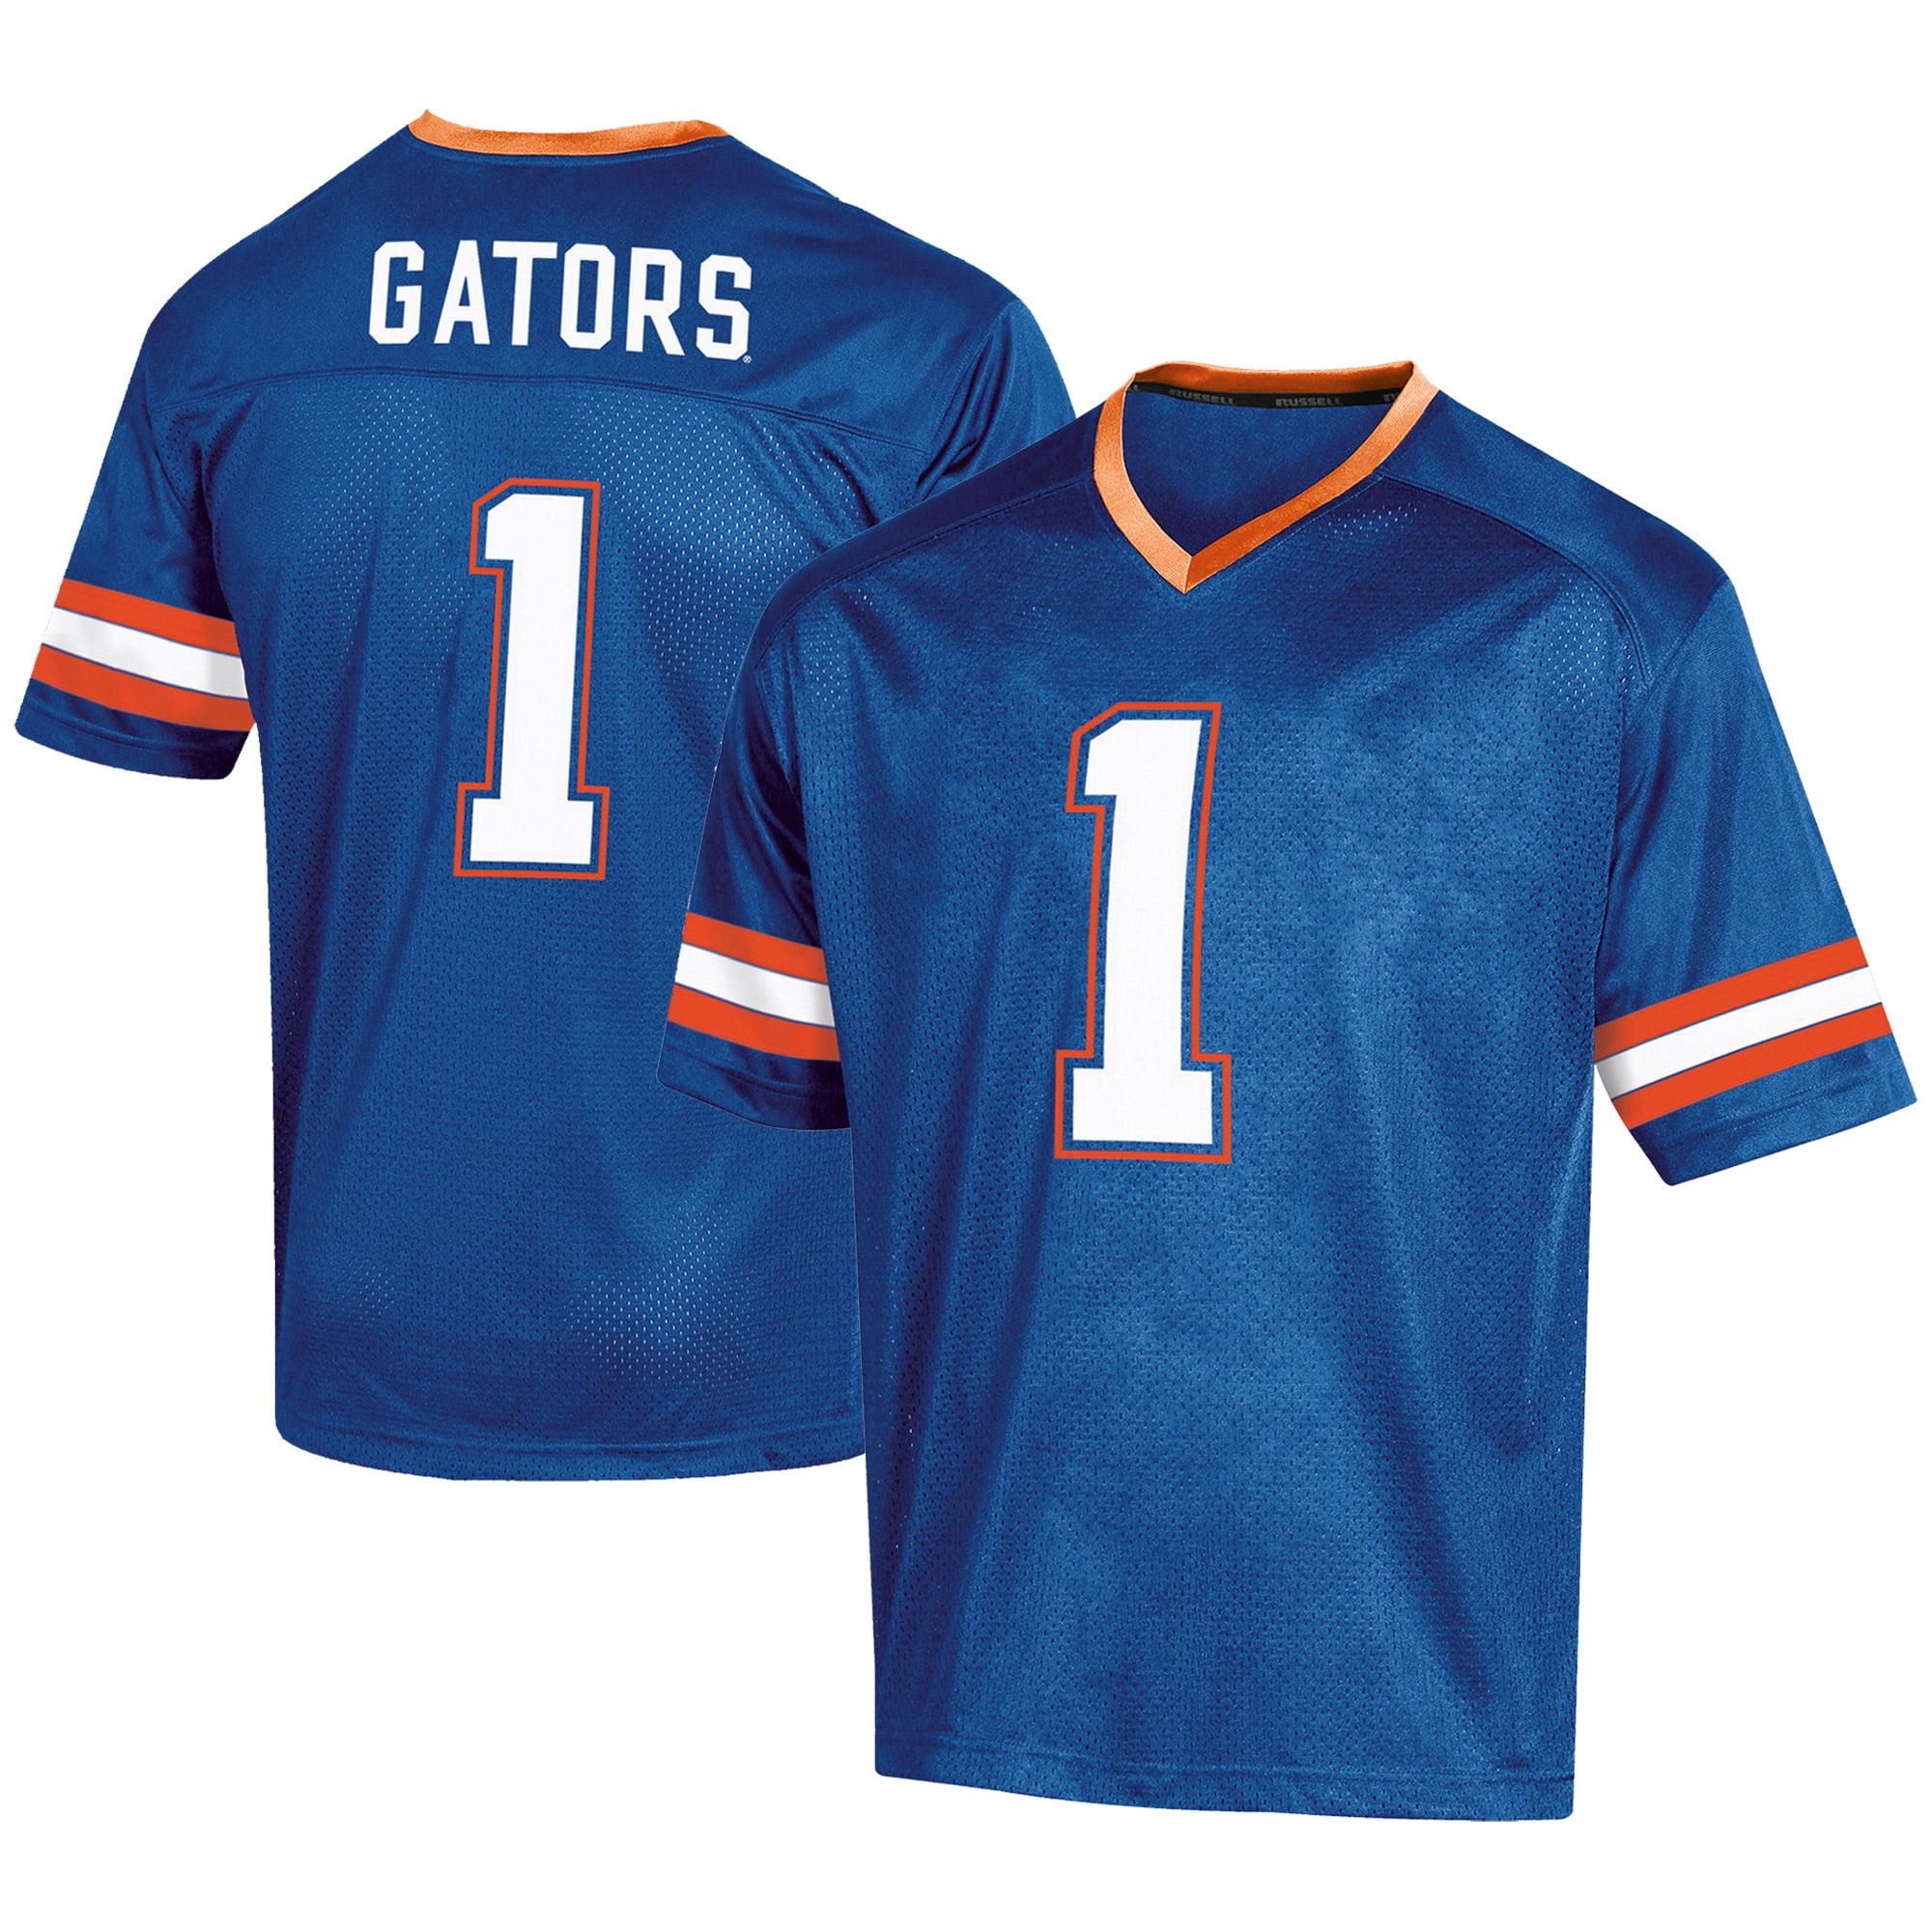 Men's Russell #1 Royal Florida Gators Fashion Football Jersey